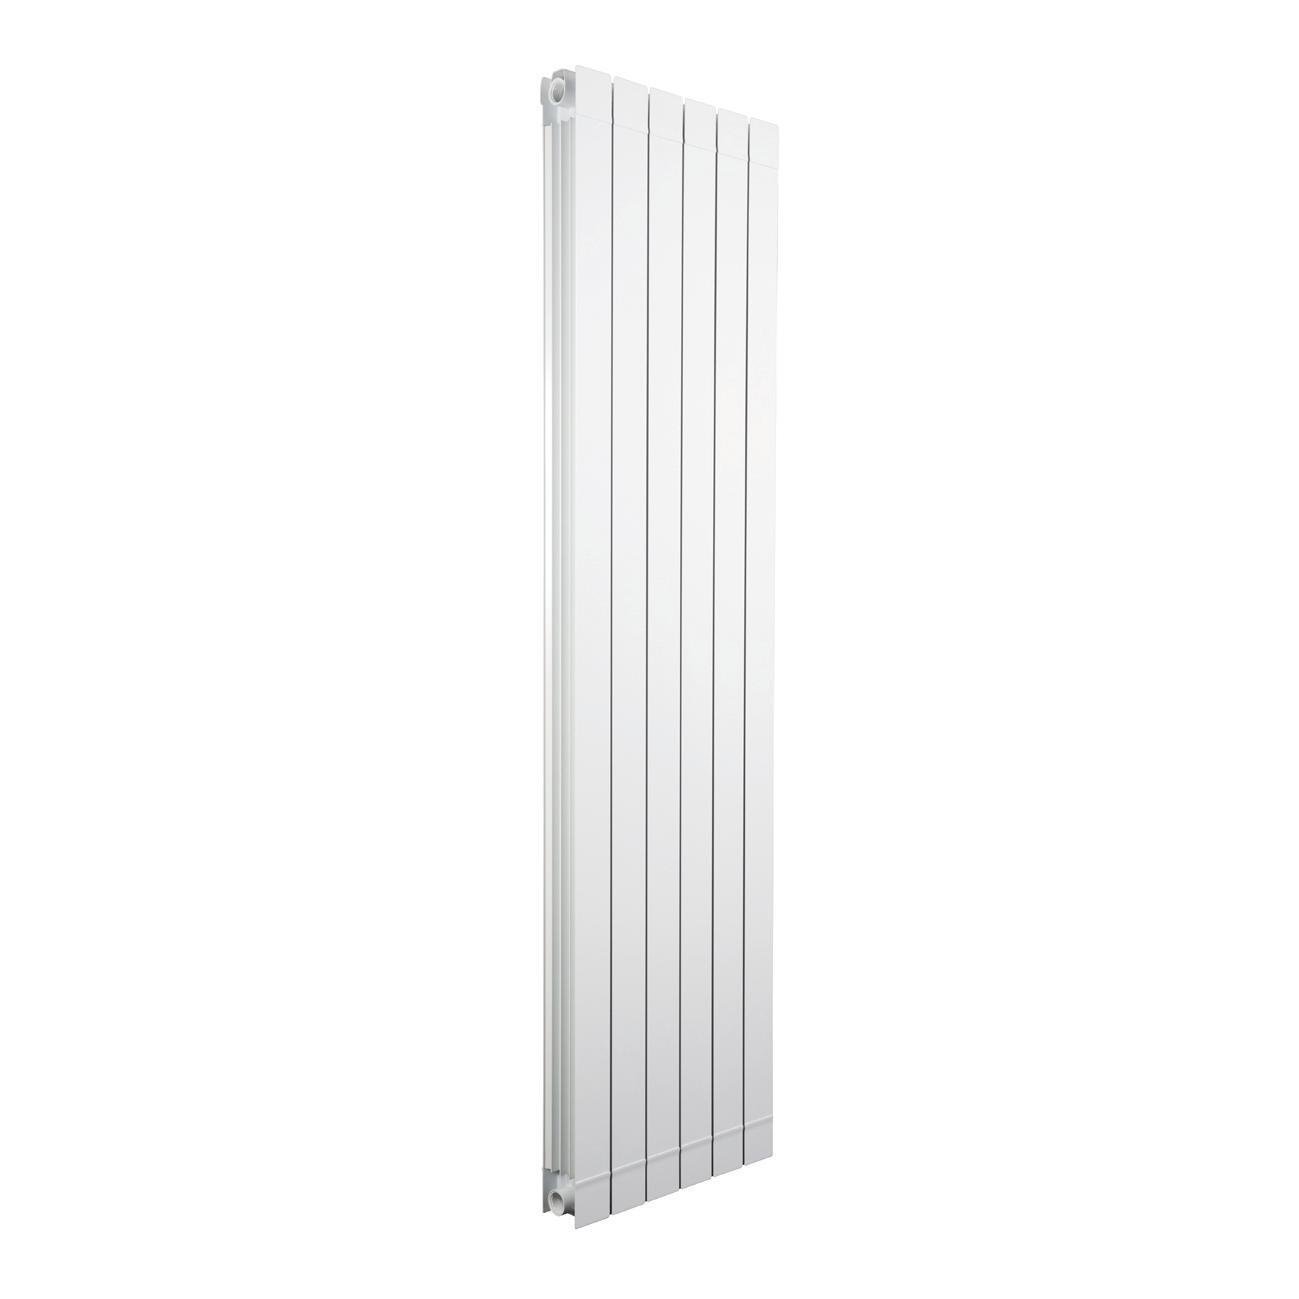 Radiatore acqua calda PRODIGE Superior in alluminio 6 elementi interasse 180 cm - 1